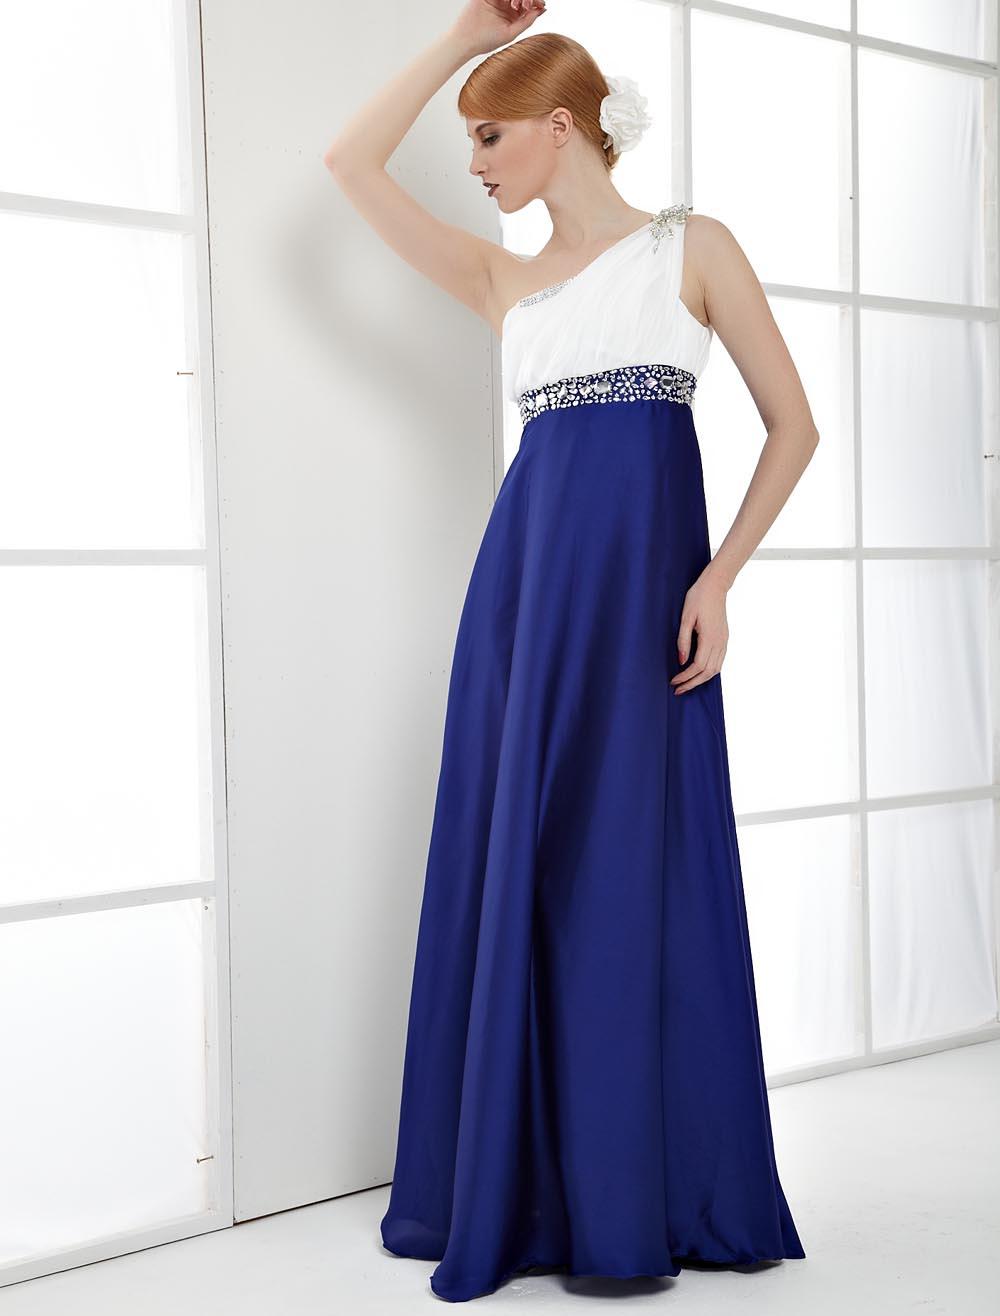 Royal Blue Elastic Woven Satin One Shoulder Prom Dress (Wedding Evening Dresses) photo